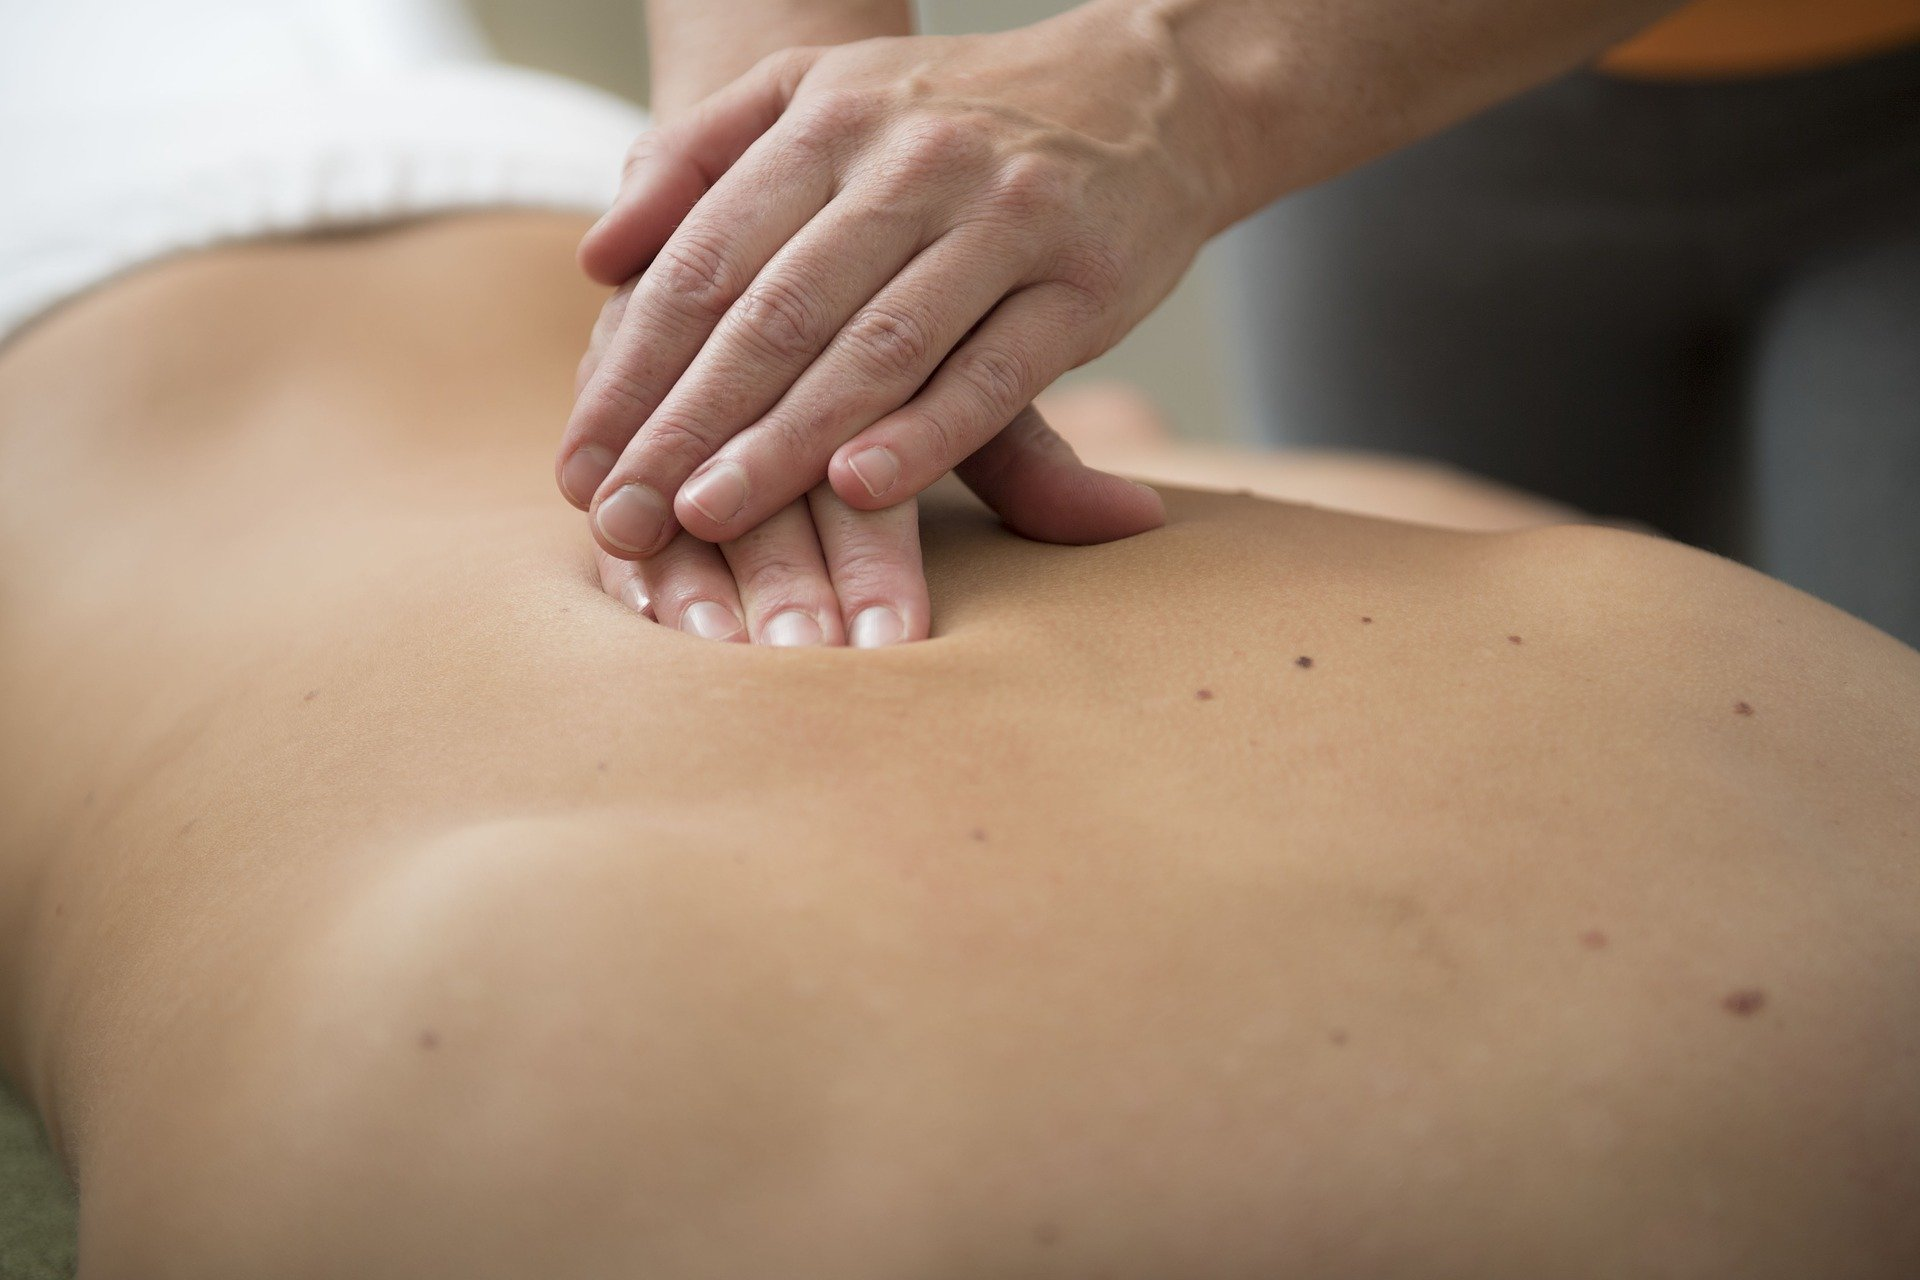 Energetische acupressuurmassage